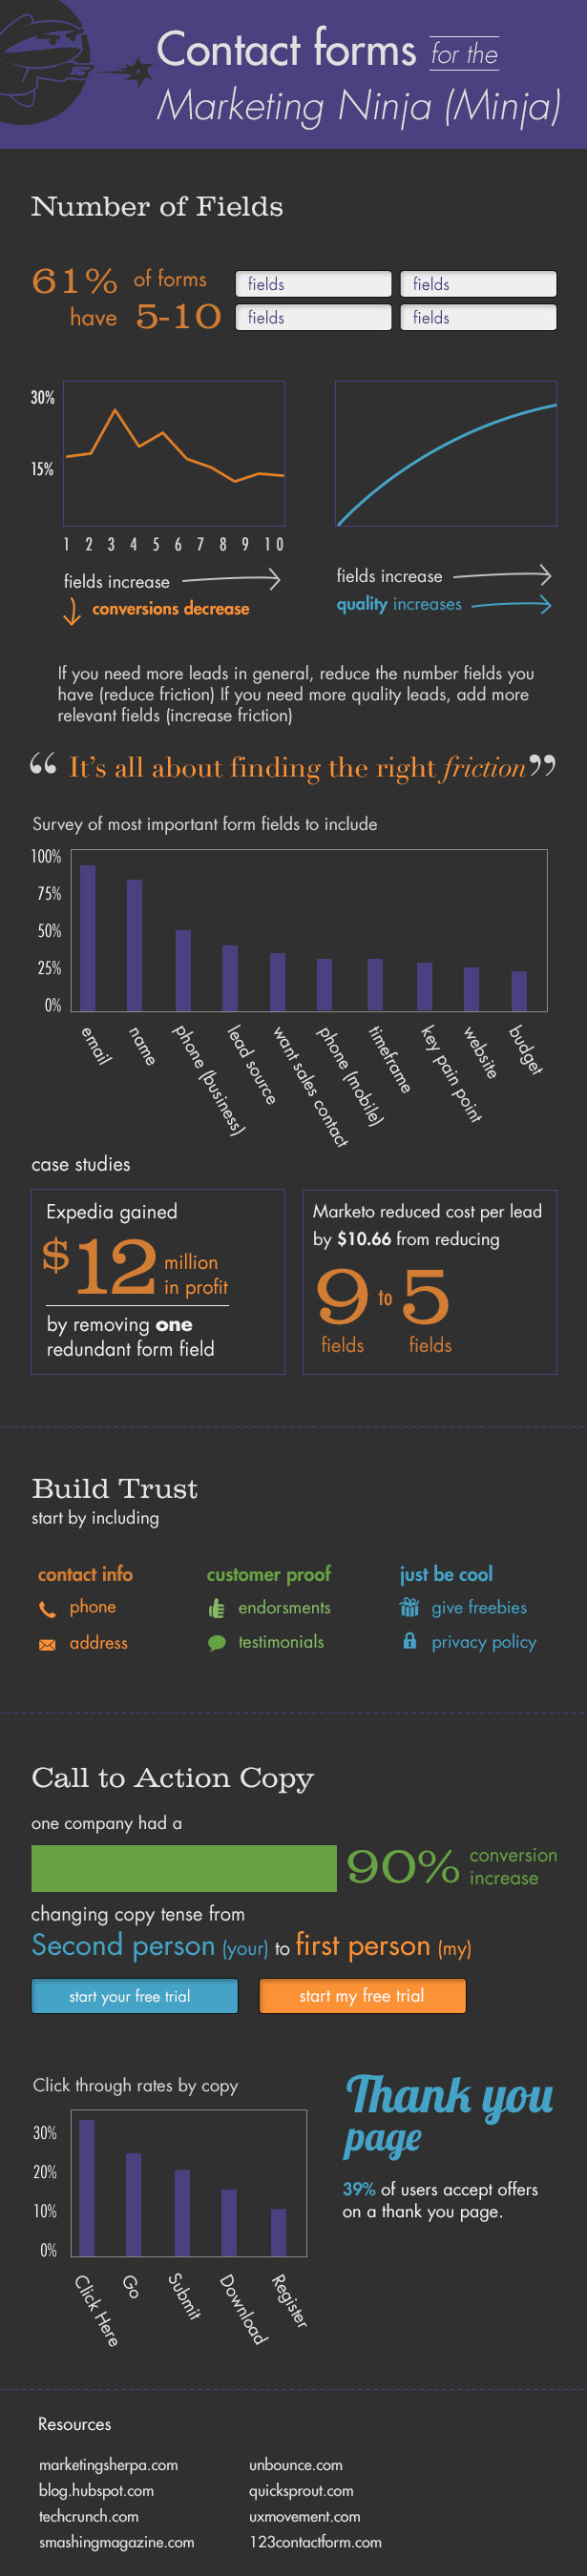 Infographic - Web Form Best Practices